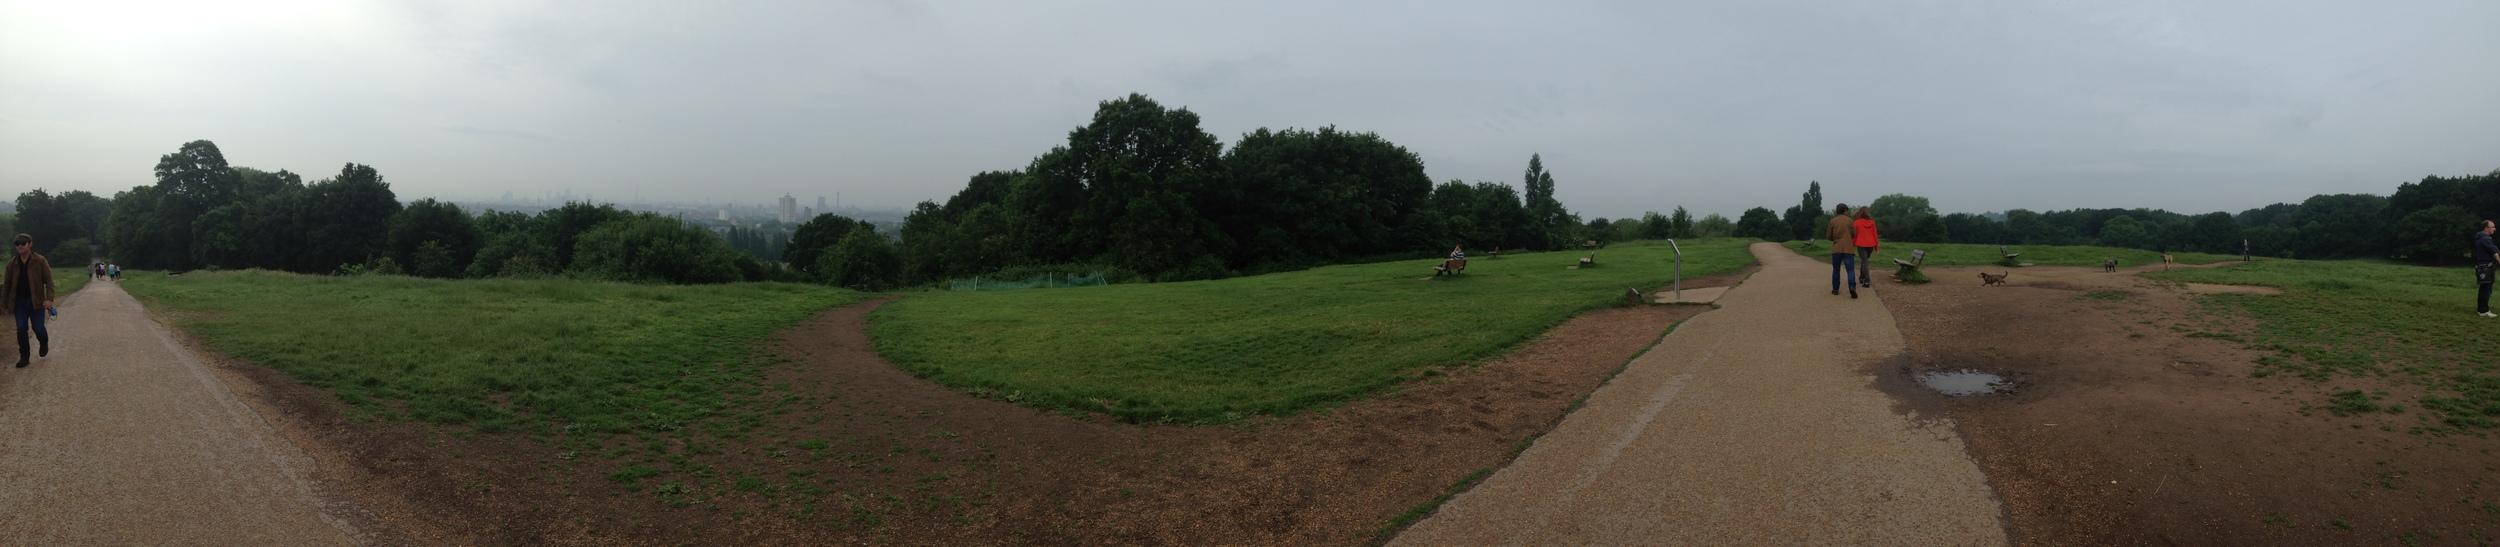 Hampstead heath panorama